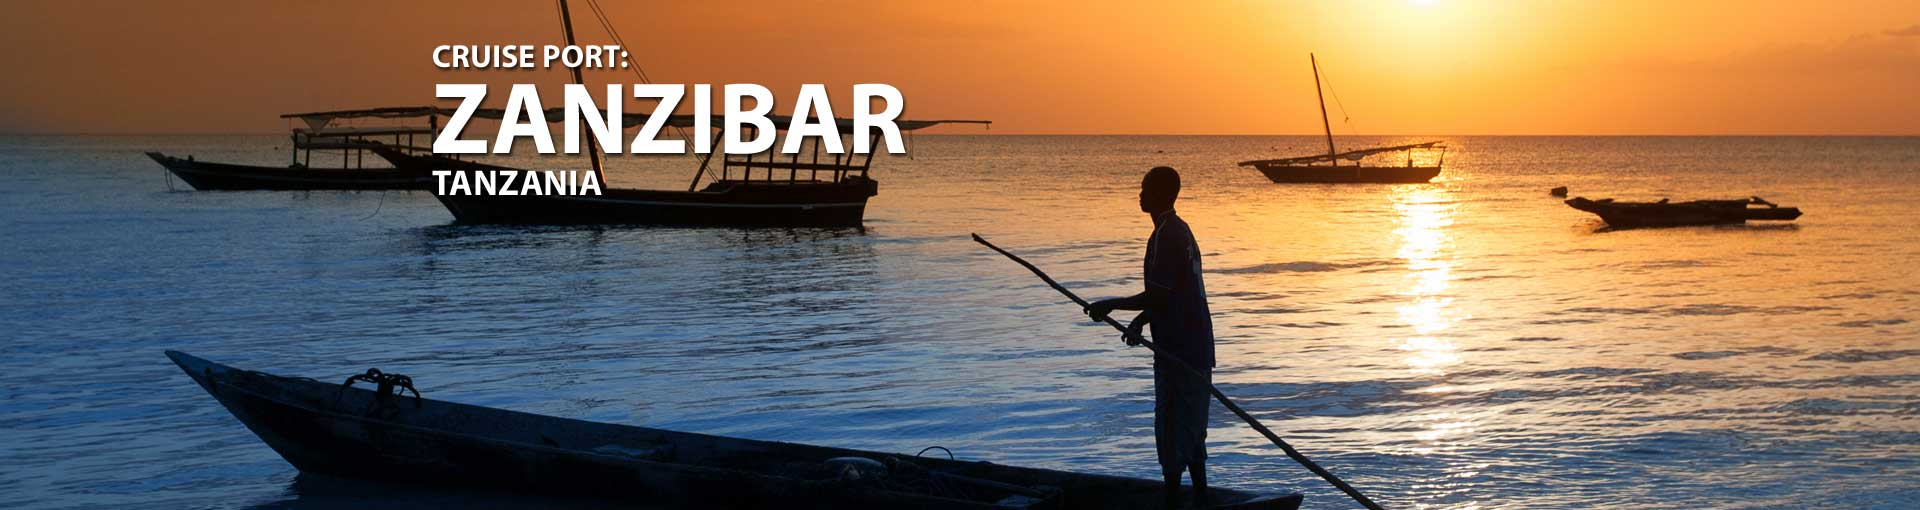 Cruises to Zanzibar, Tanzania